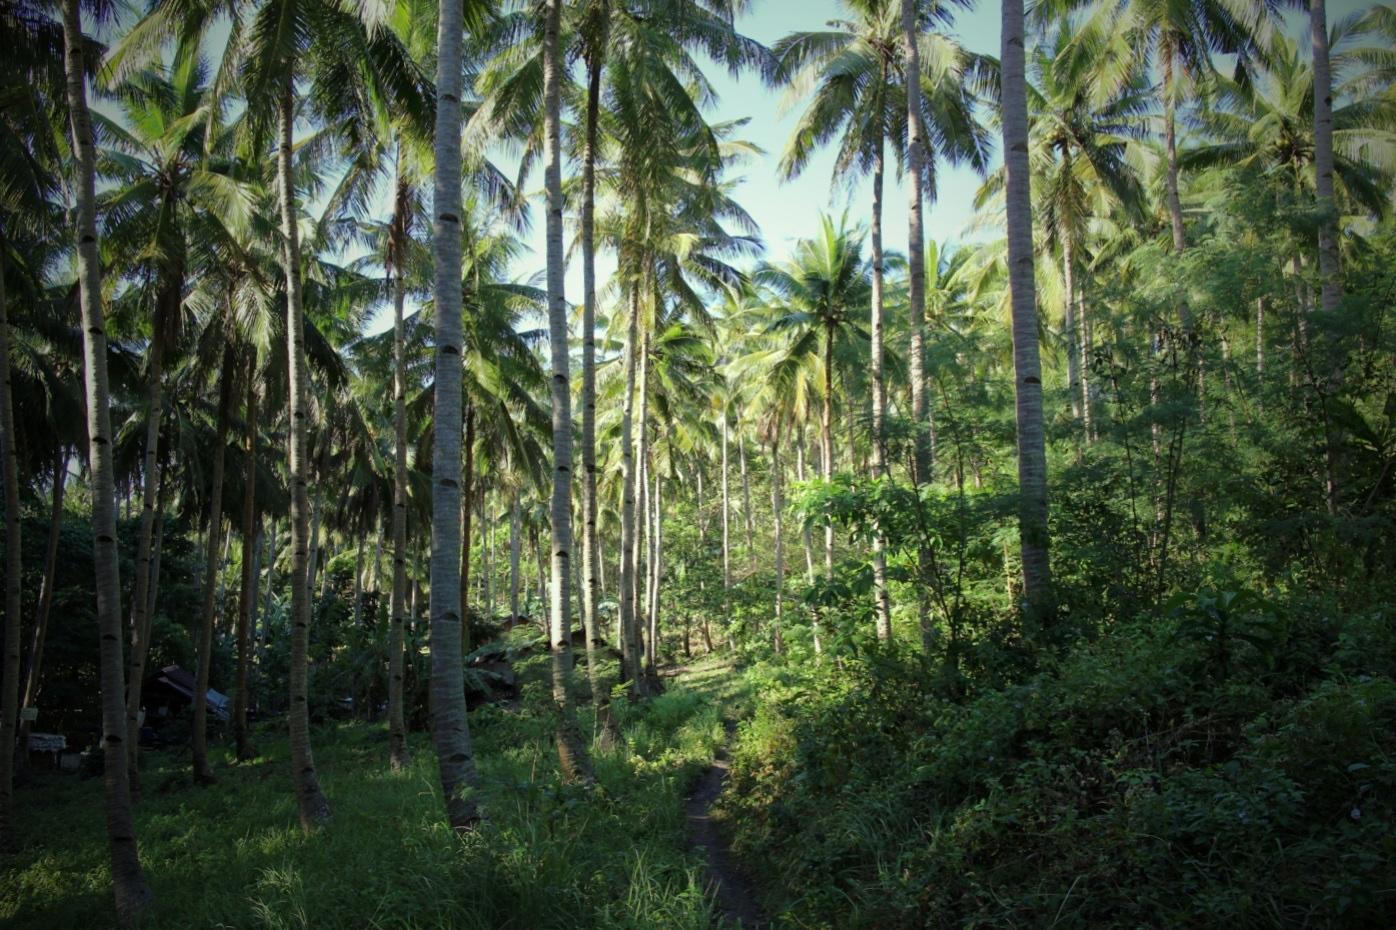 De Palmenkolonie